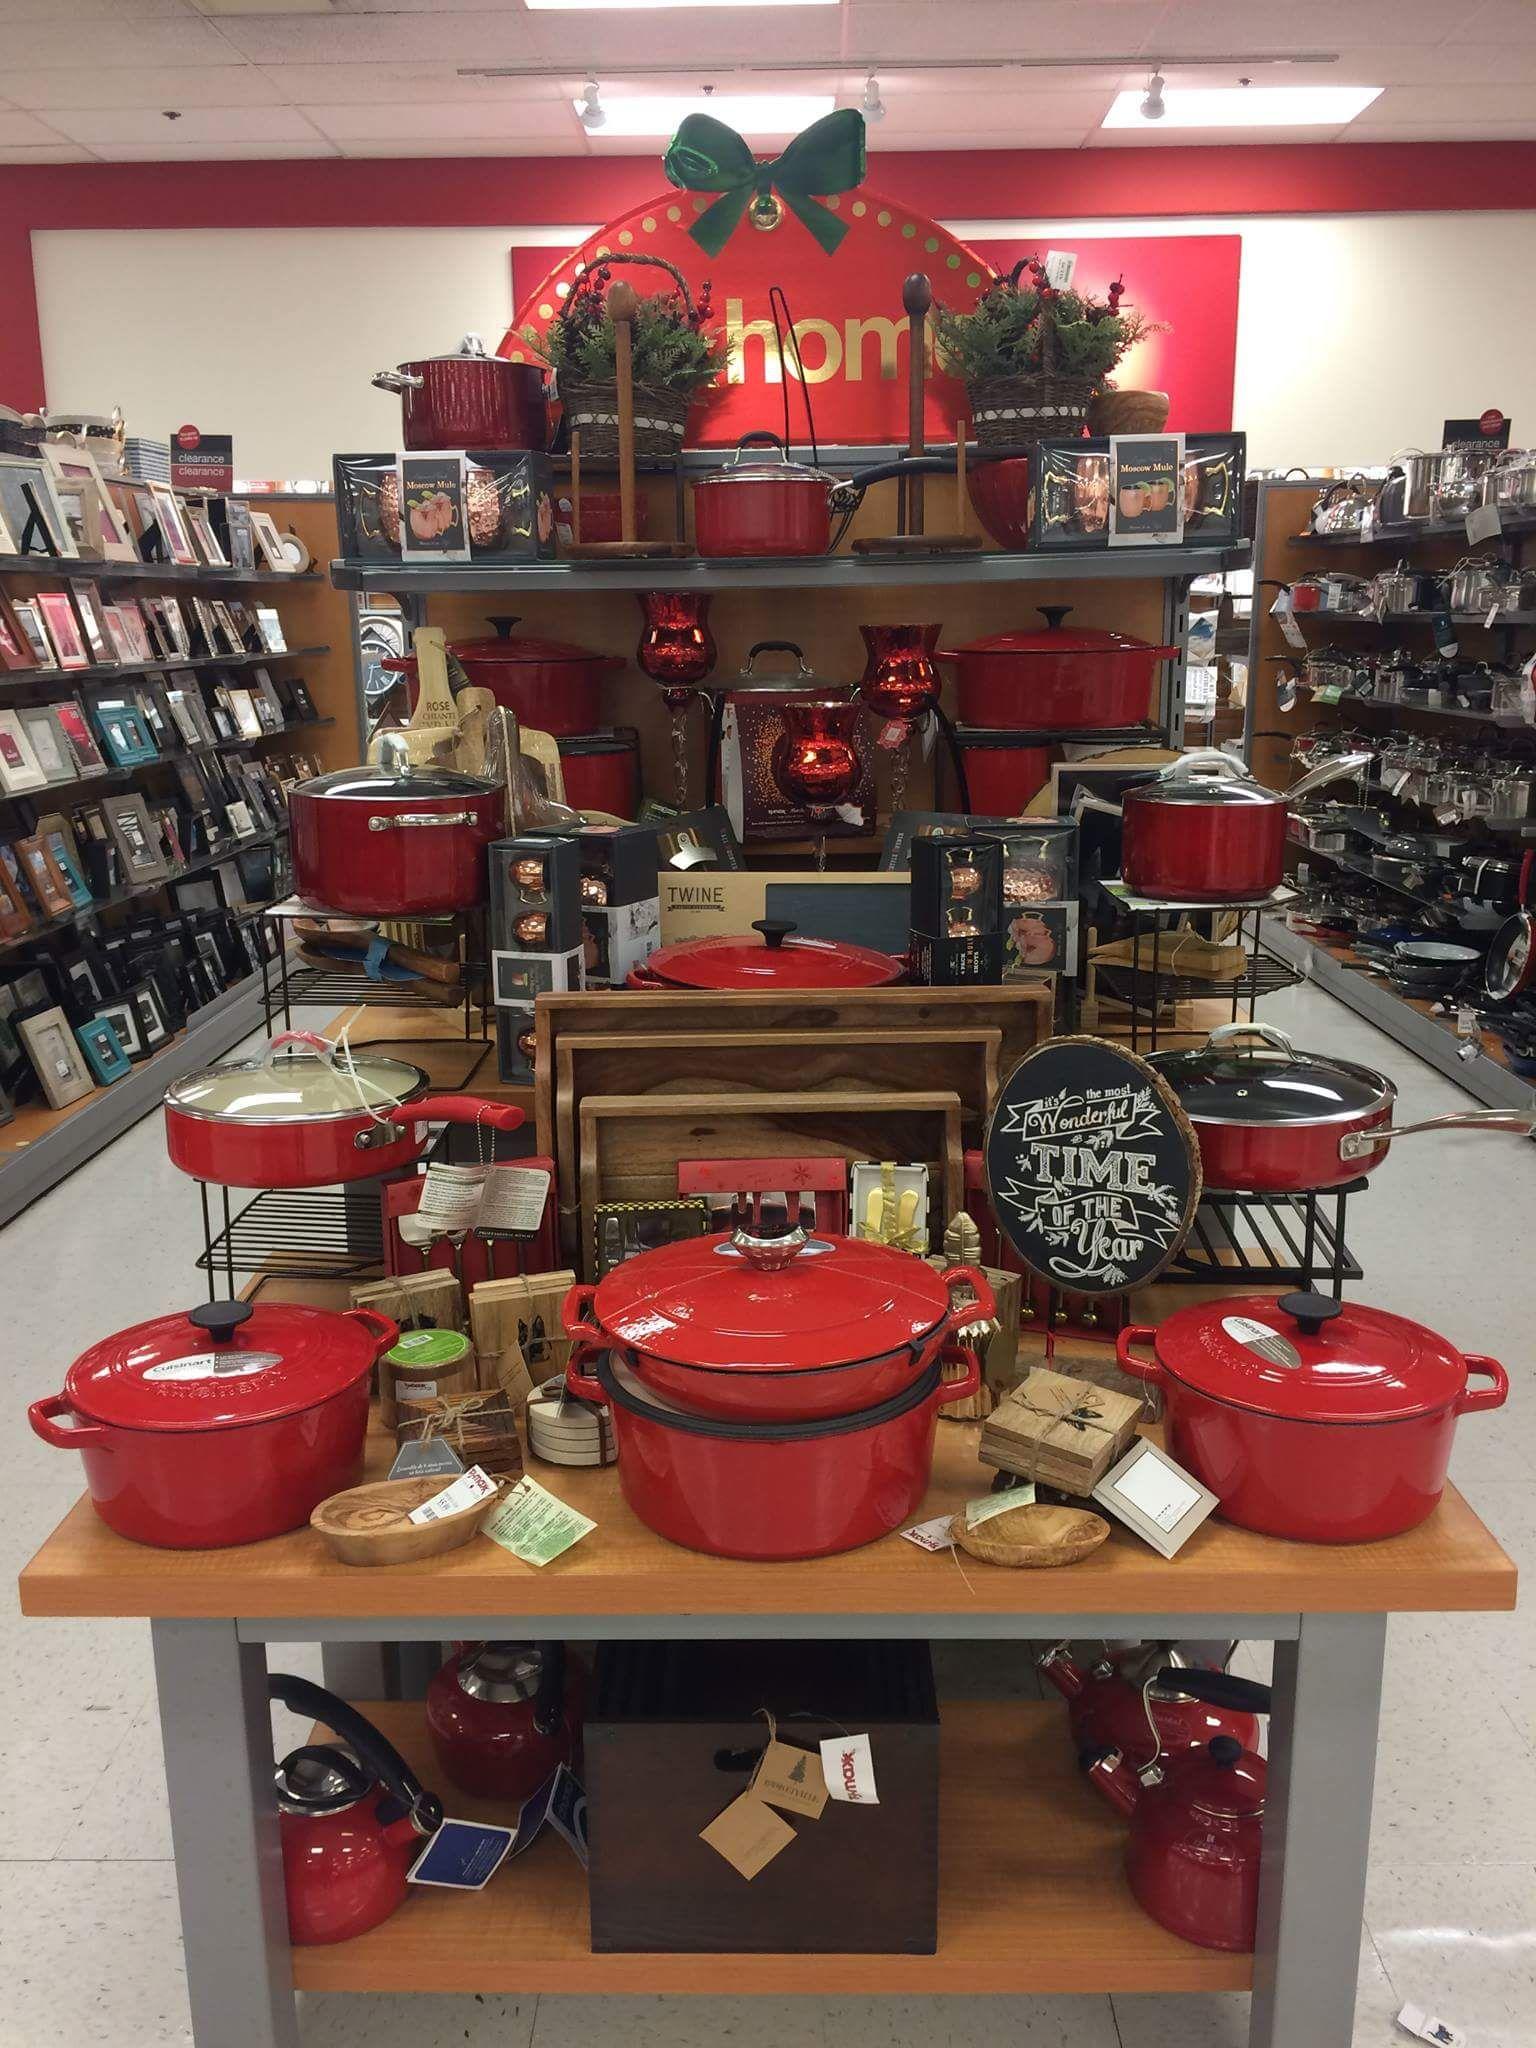 Red Cookwear Store Shelves Design Store Displays Merchandising Displays